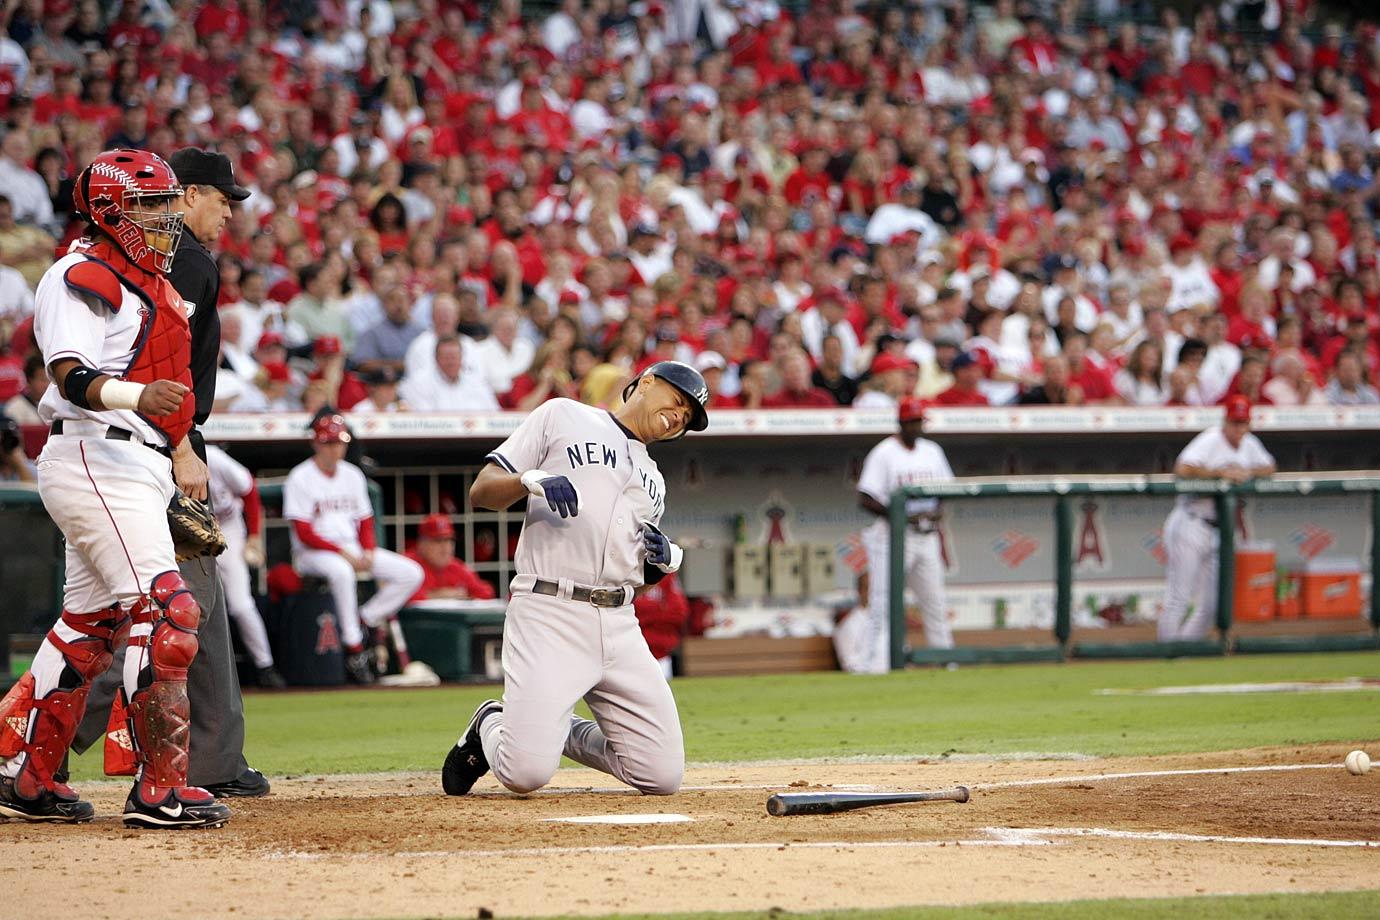 2005 American League Division Series, Game 1